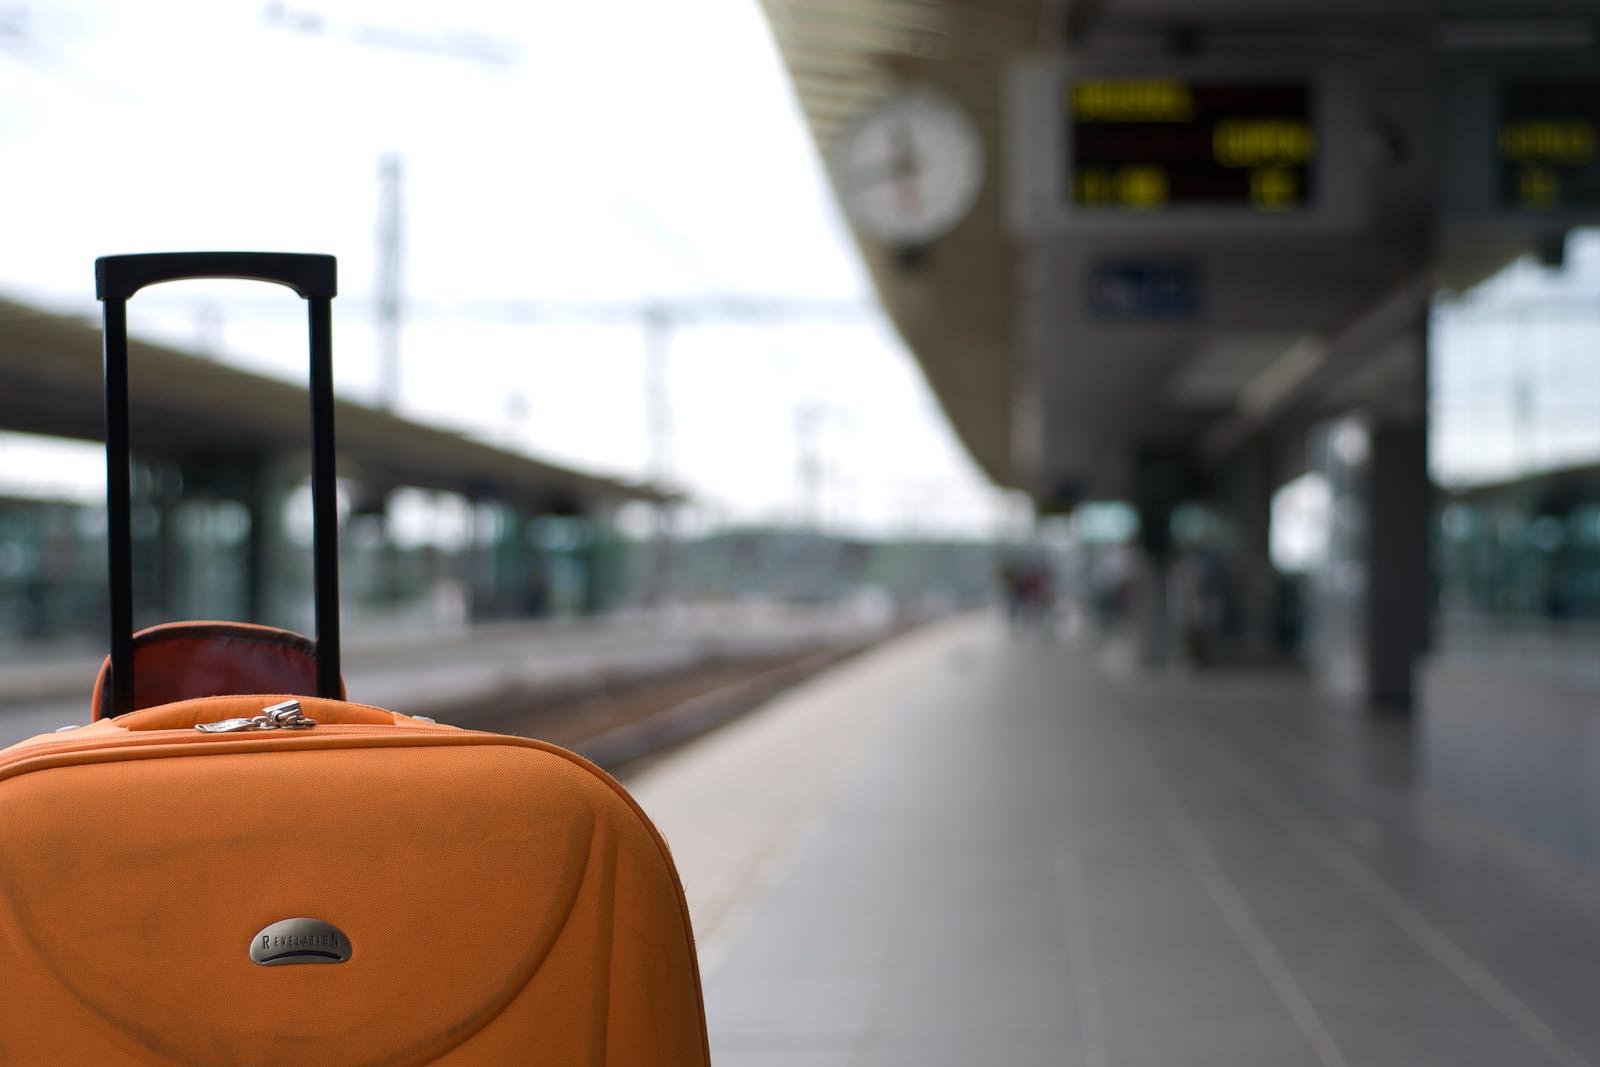 Suitcase on the platform | YWAM Sydney, Newtown | Australia